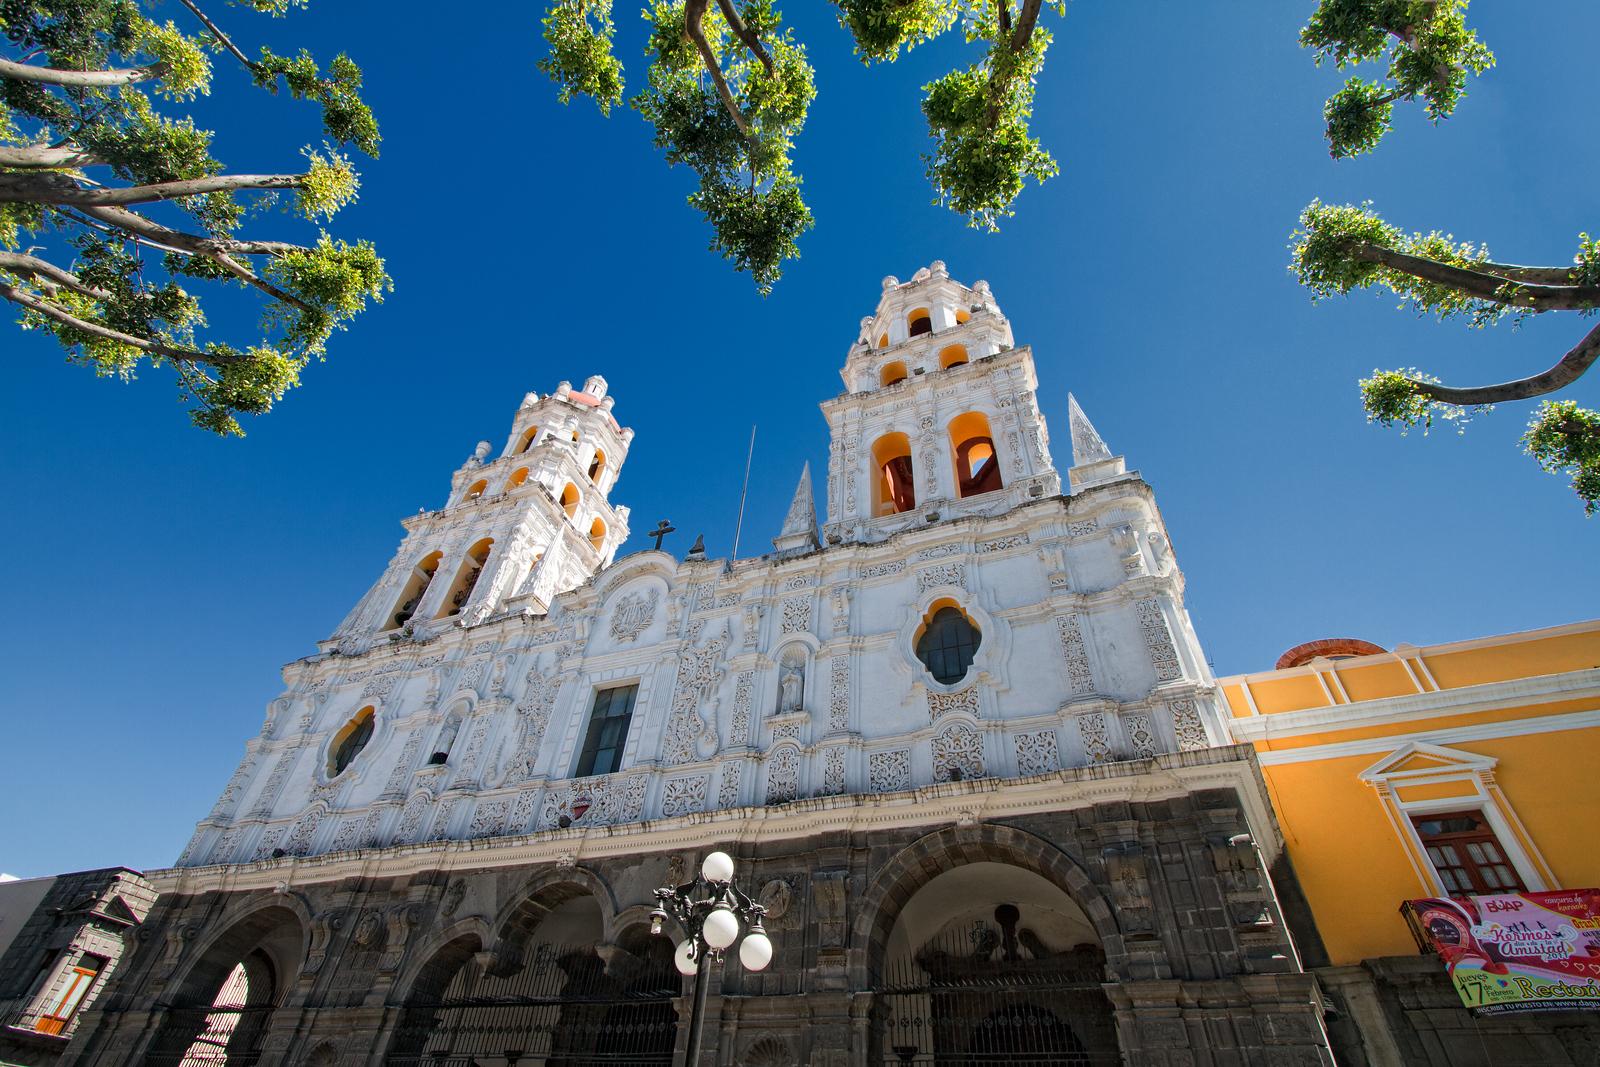 The sumptuous Iglesia de la compania.